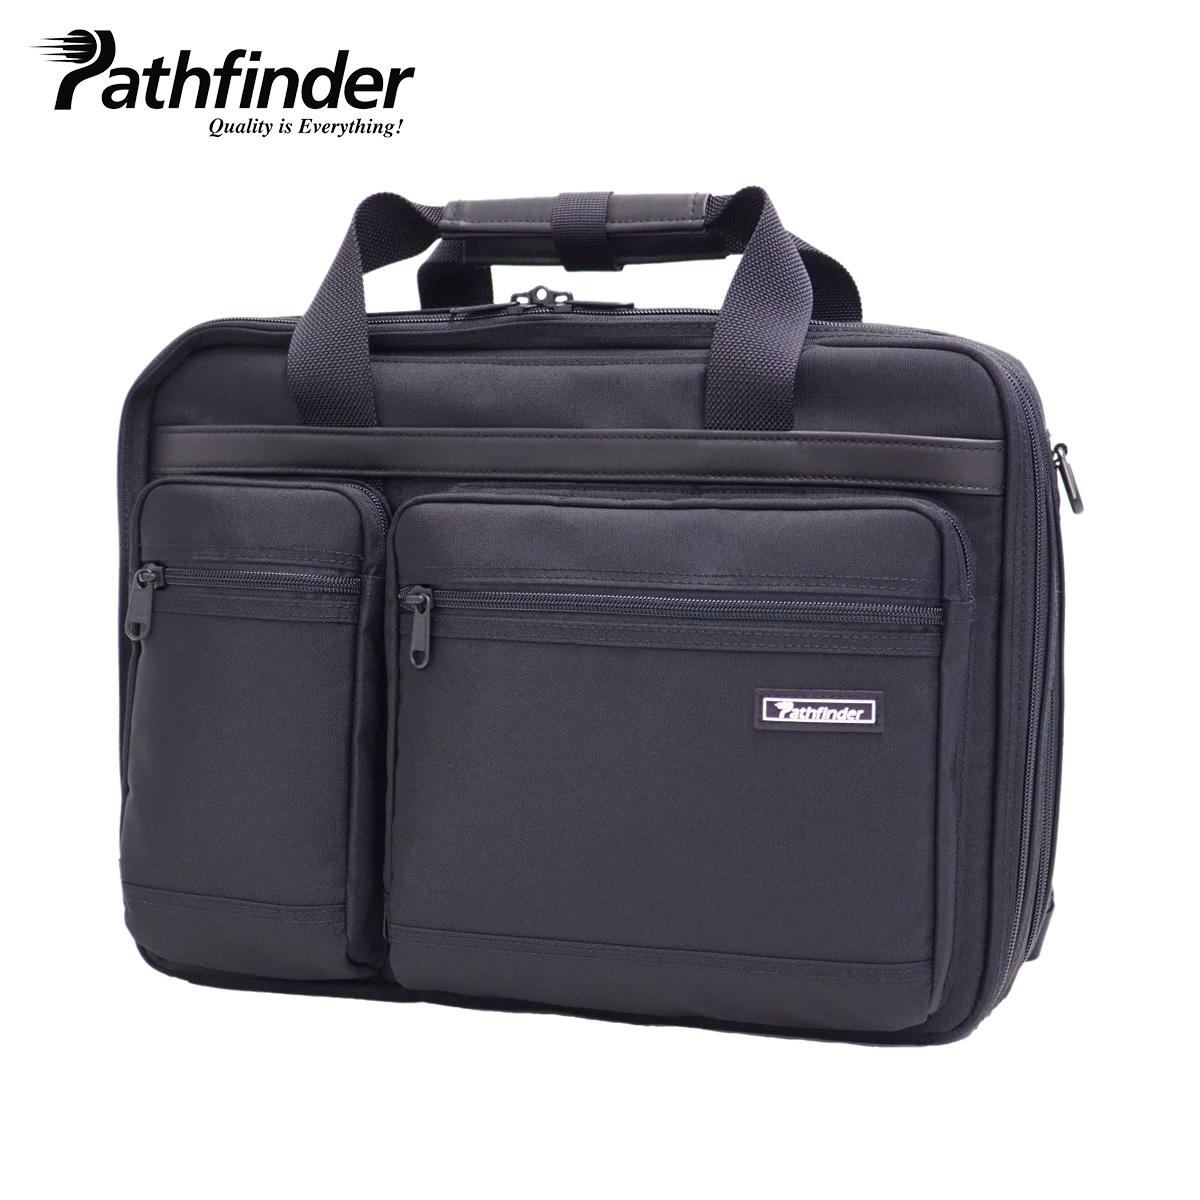 Pathfinder AVENGER 2 3 WAY BAG パスファインダー アベンジャー2 3ウェイ リュック バッグ バックパック ビジネスバッグ ショルダー メンズ ブラック 黒 PF1901B